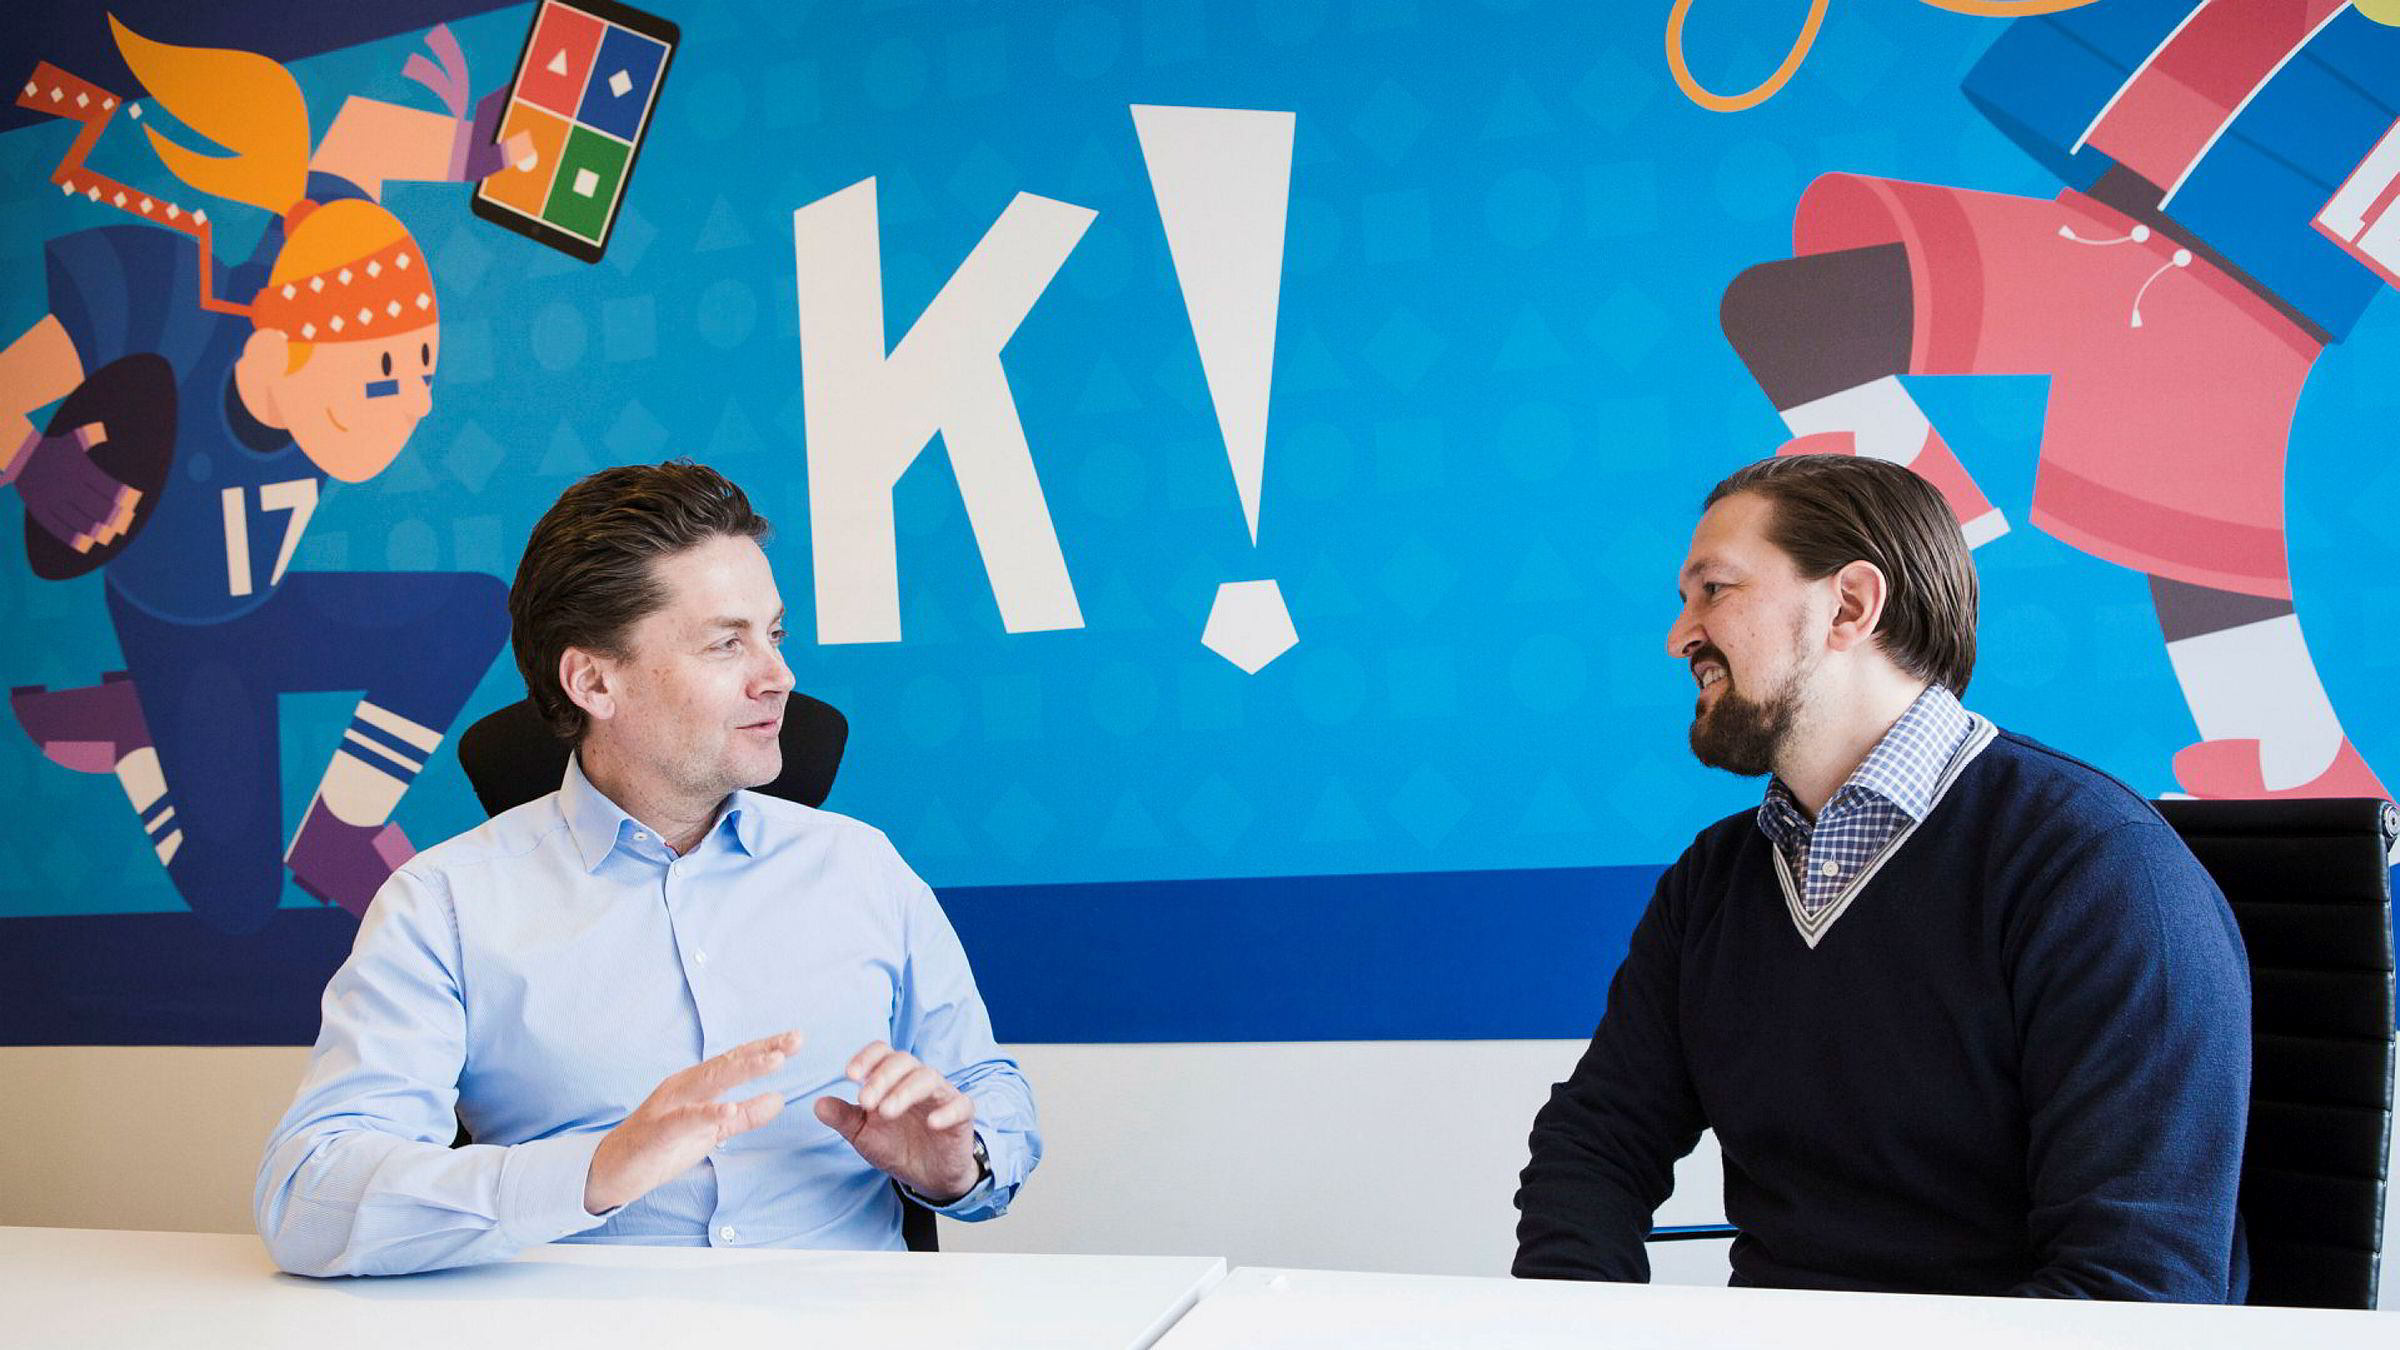 Kahoots tidligere styreleder og ferske administrerende direktør Eilert Hanoa (til venstre) og medgründer og produktsjef Åsmund Furuseth.